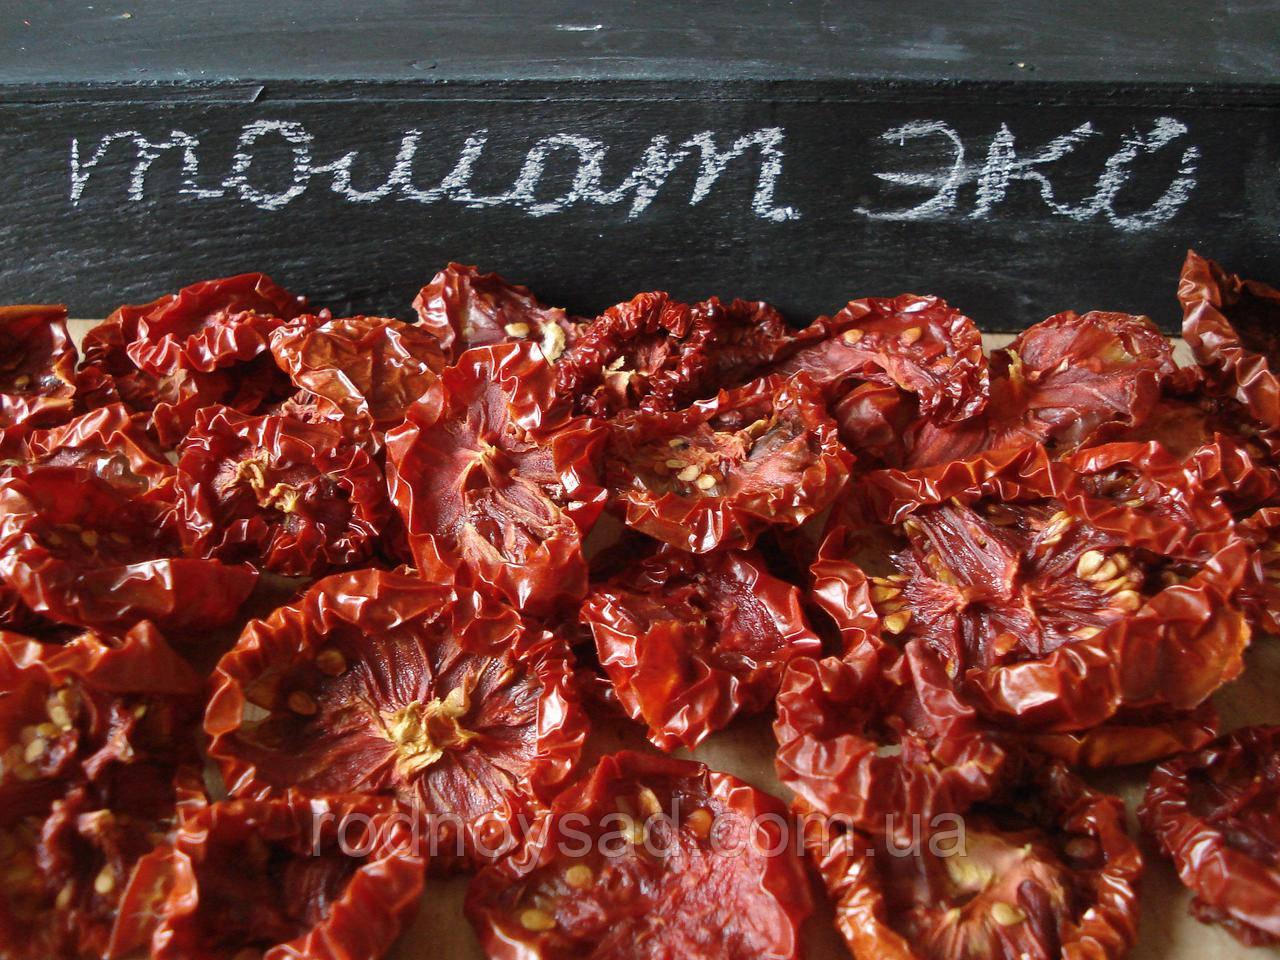 Помидор (томат) сушеный домашний (100 грамм)